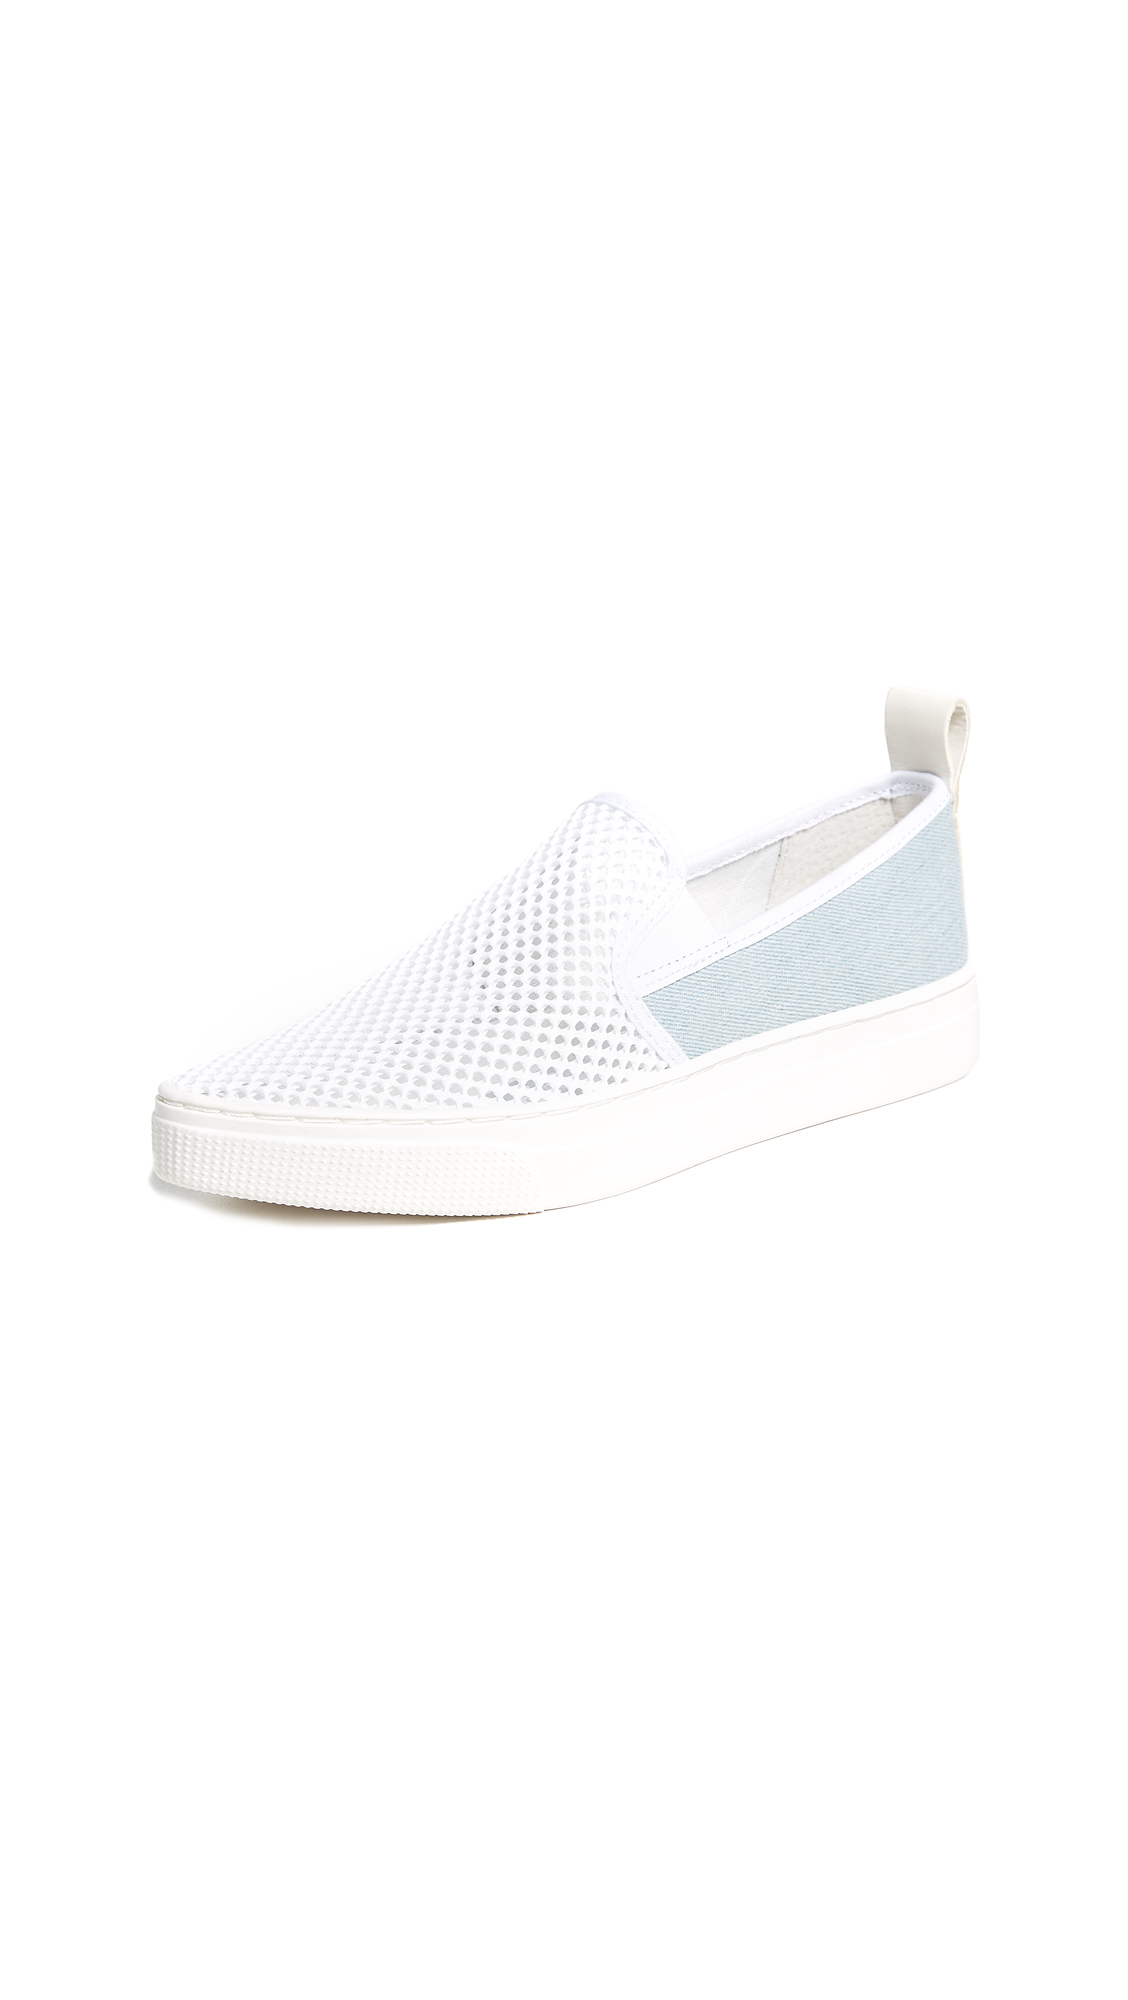 Dolce Vita Geoff Woven Sneakers - White